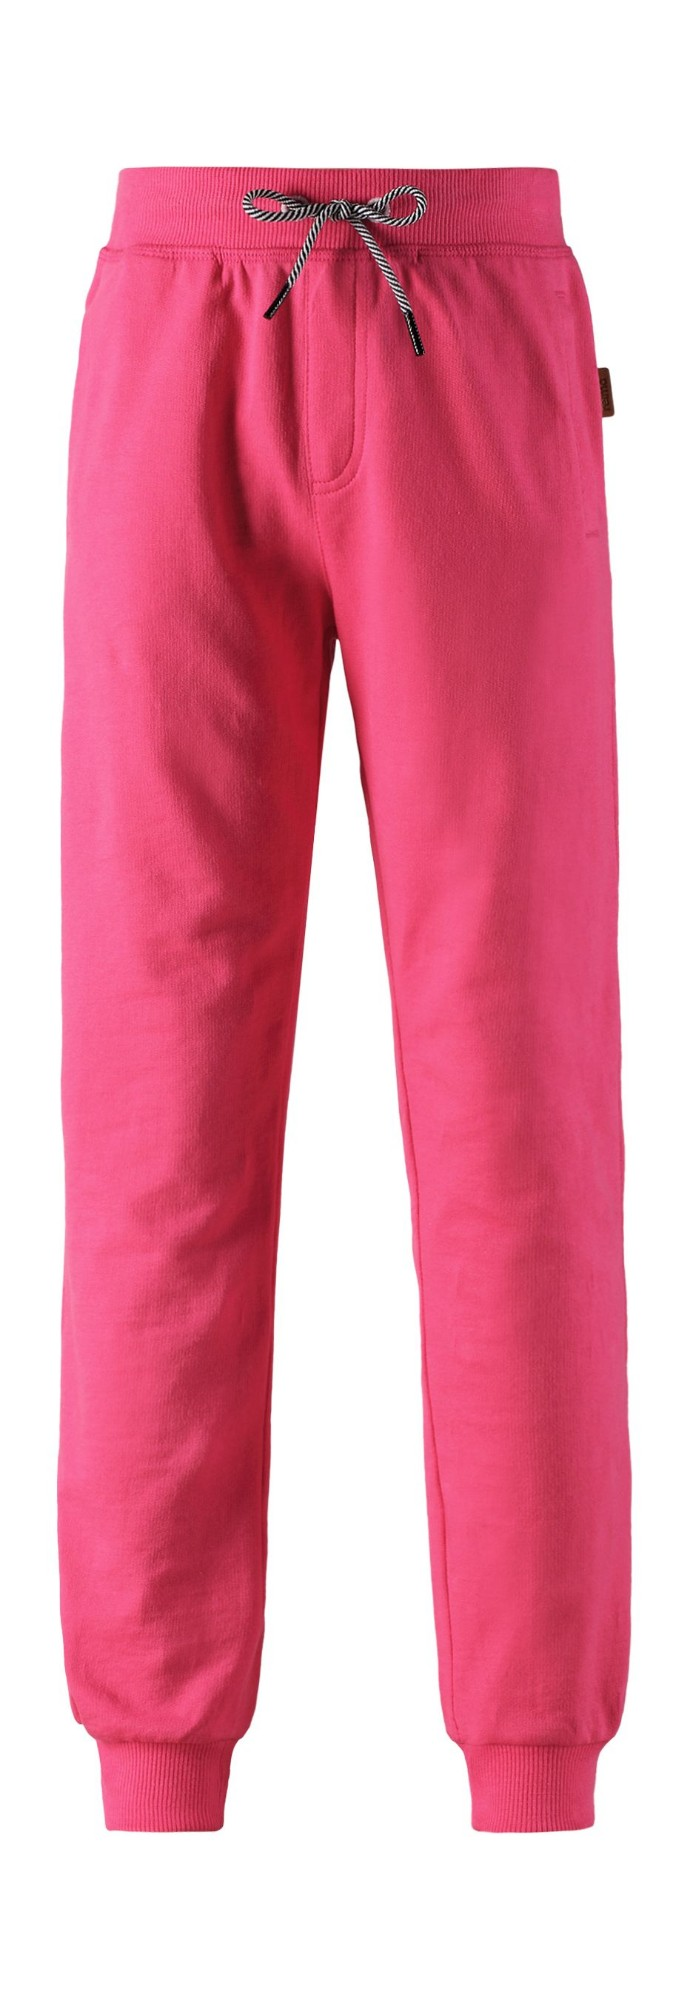 REIMA Suula Candy Pink 152